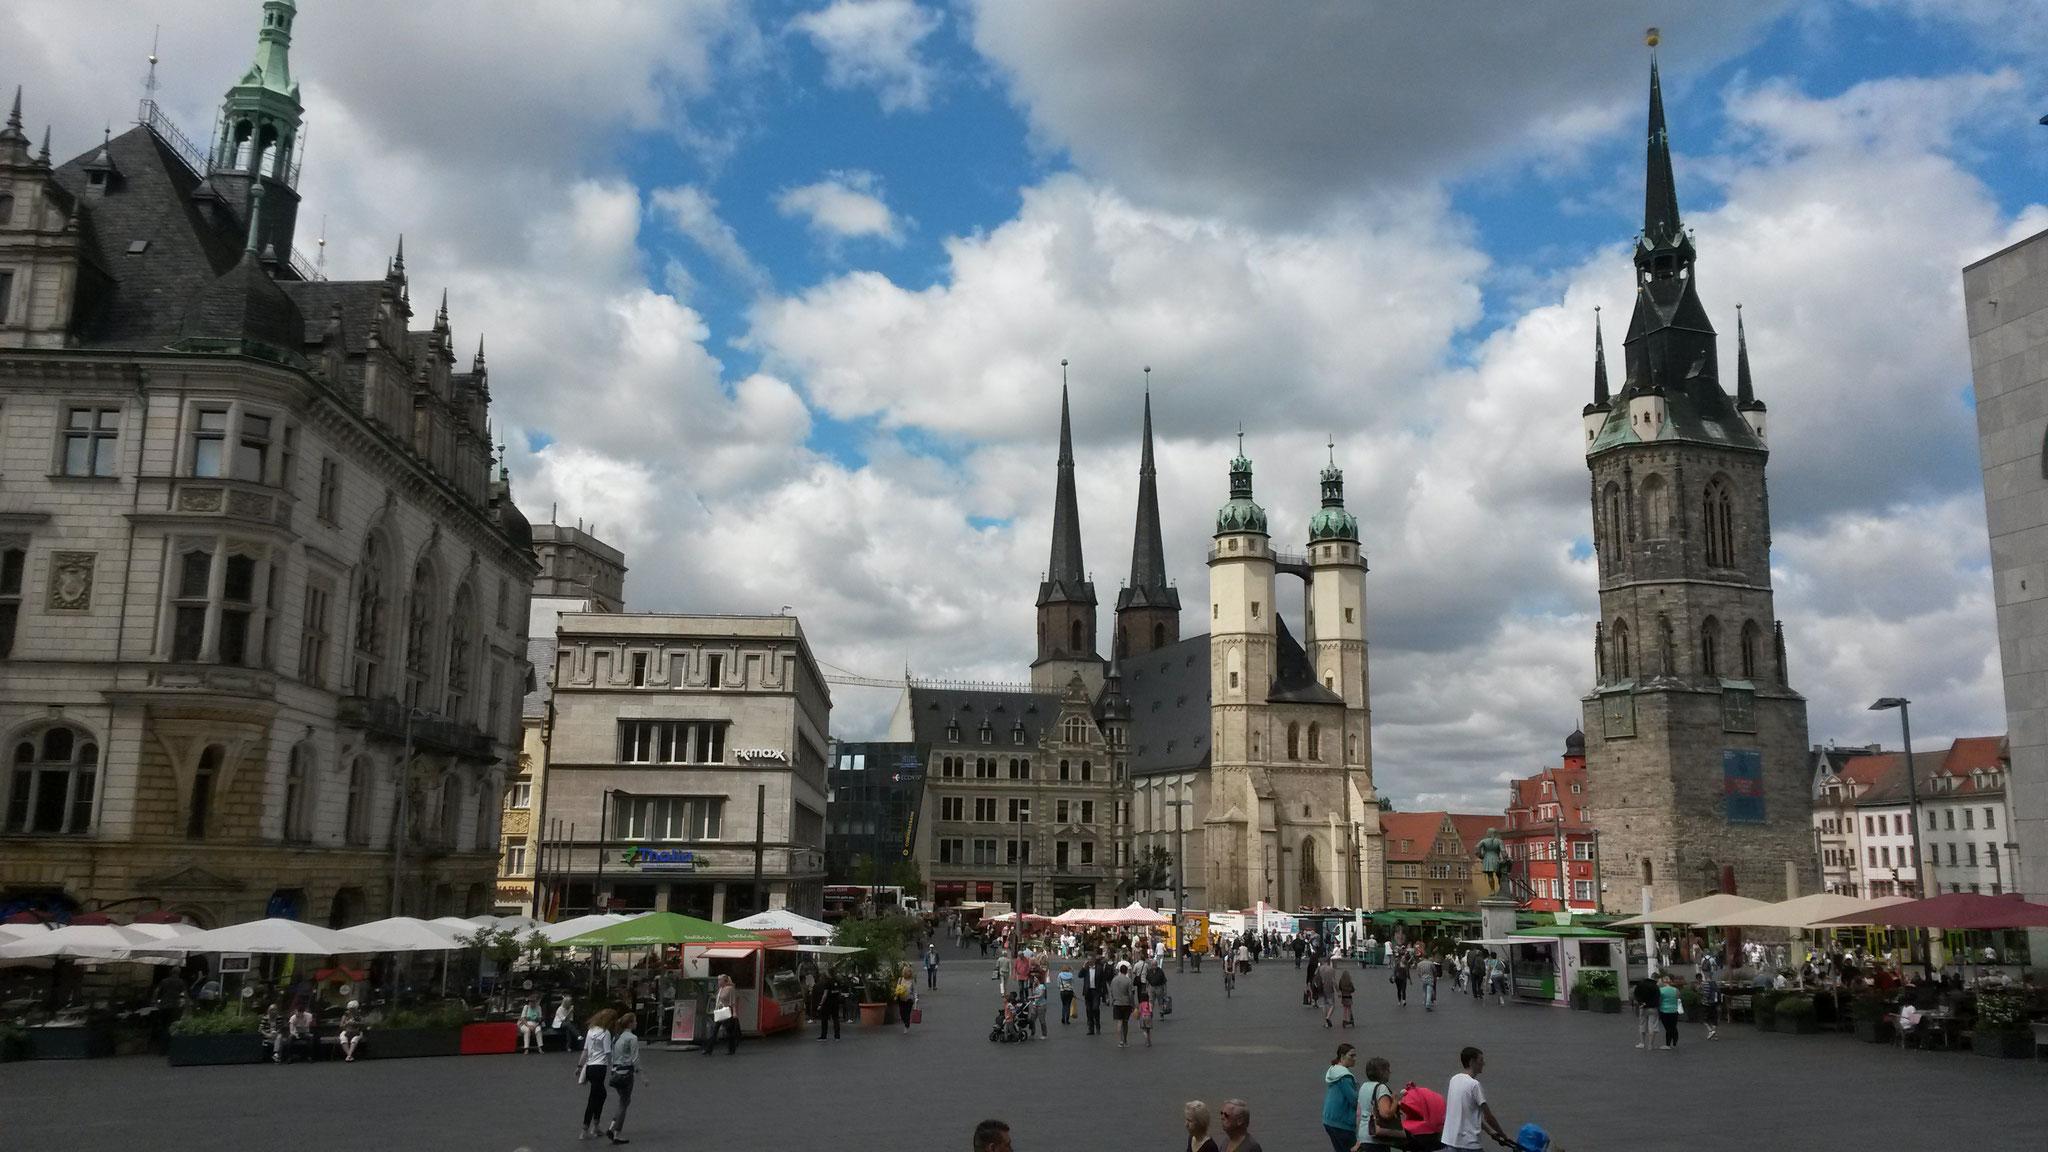 Halle (Saale) - Markt